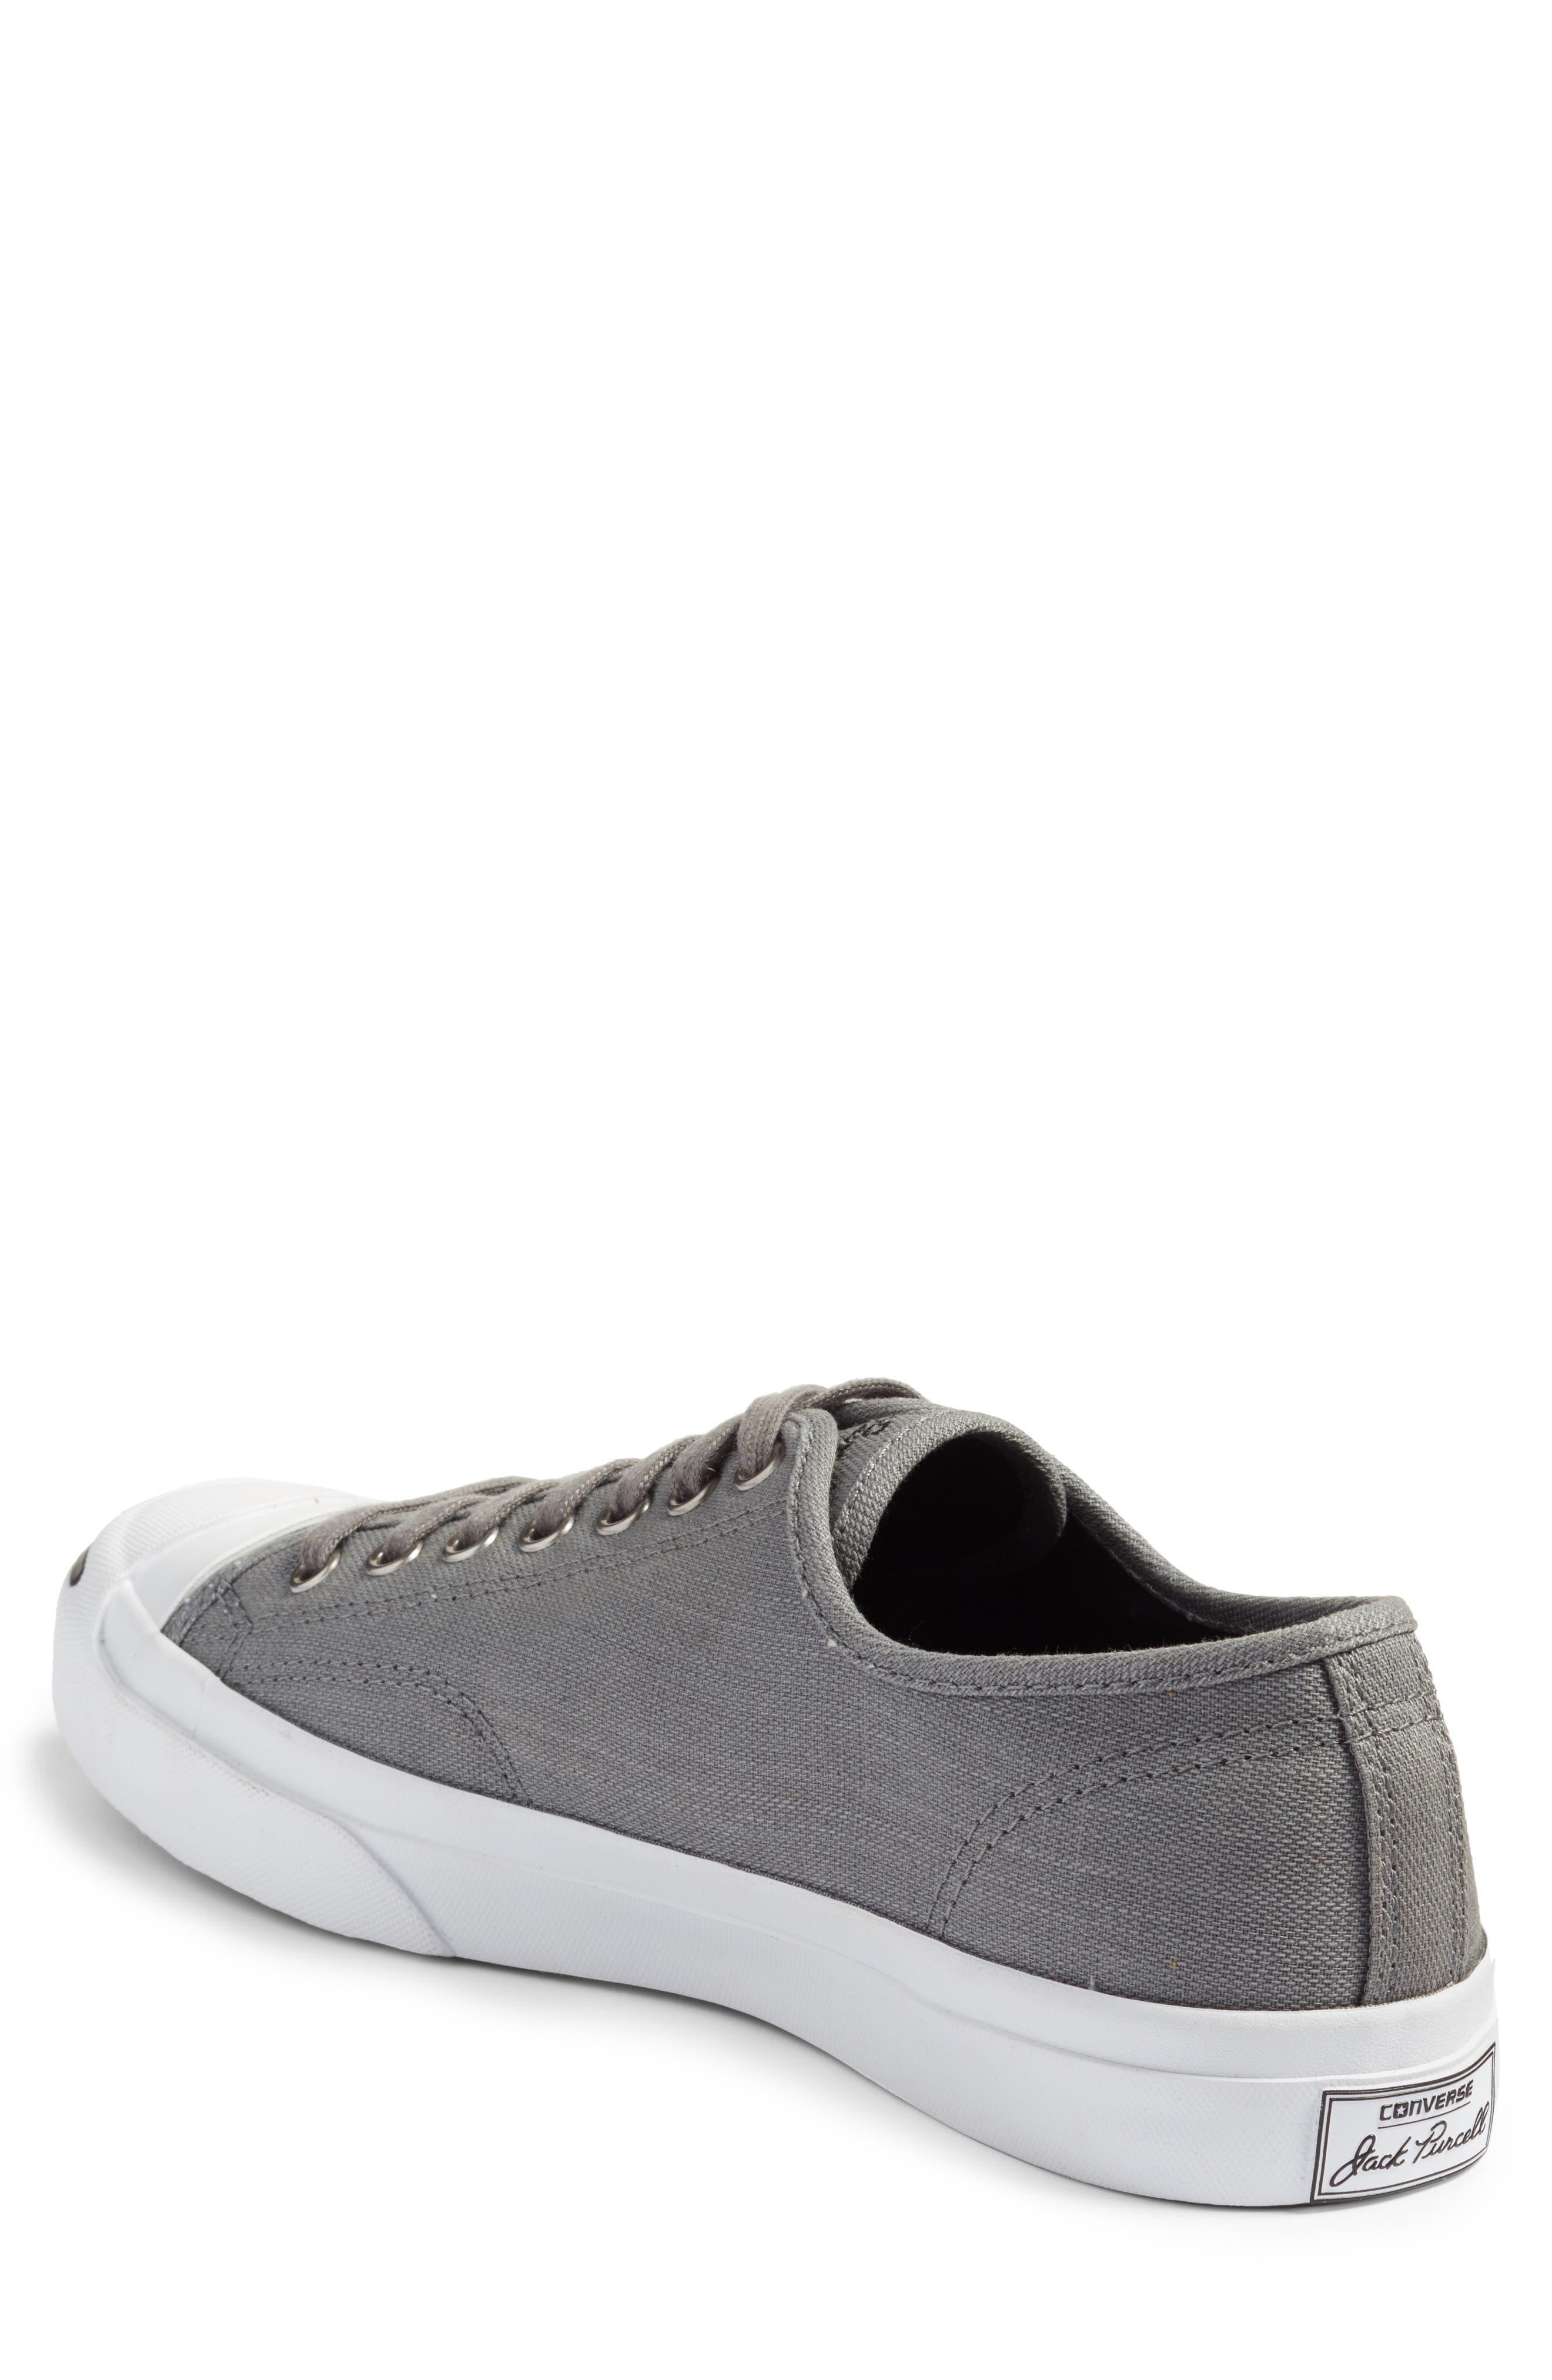 Alternate Image 2  - Converse Jack Purcell Ox Sneaker (Men)